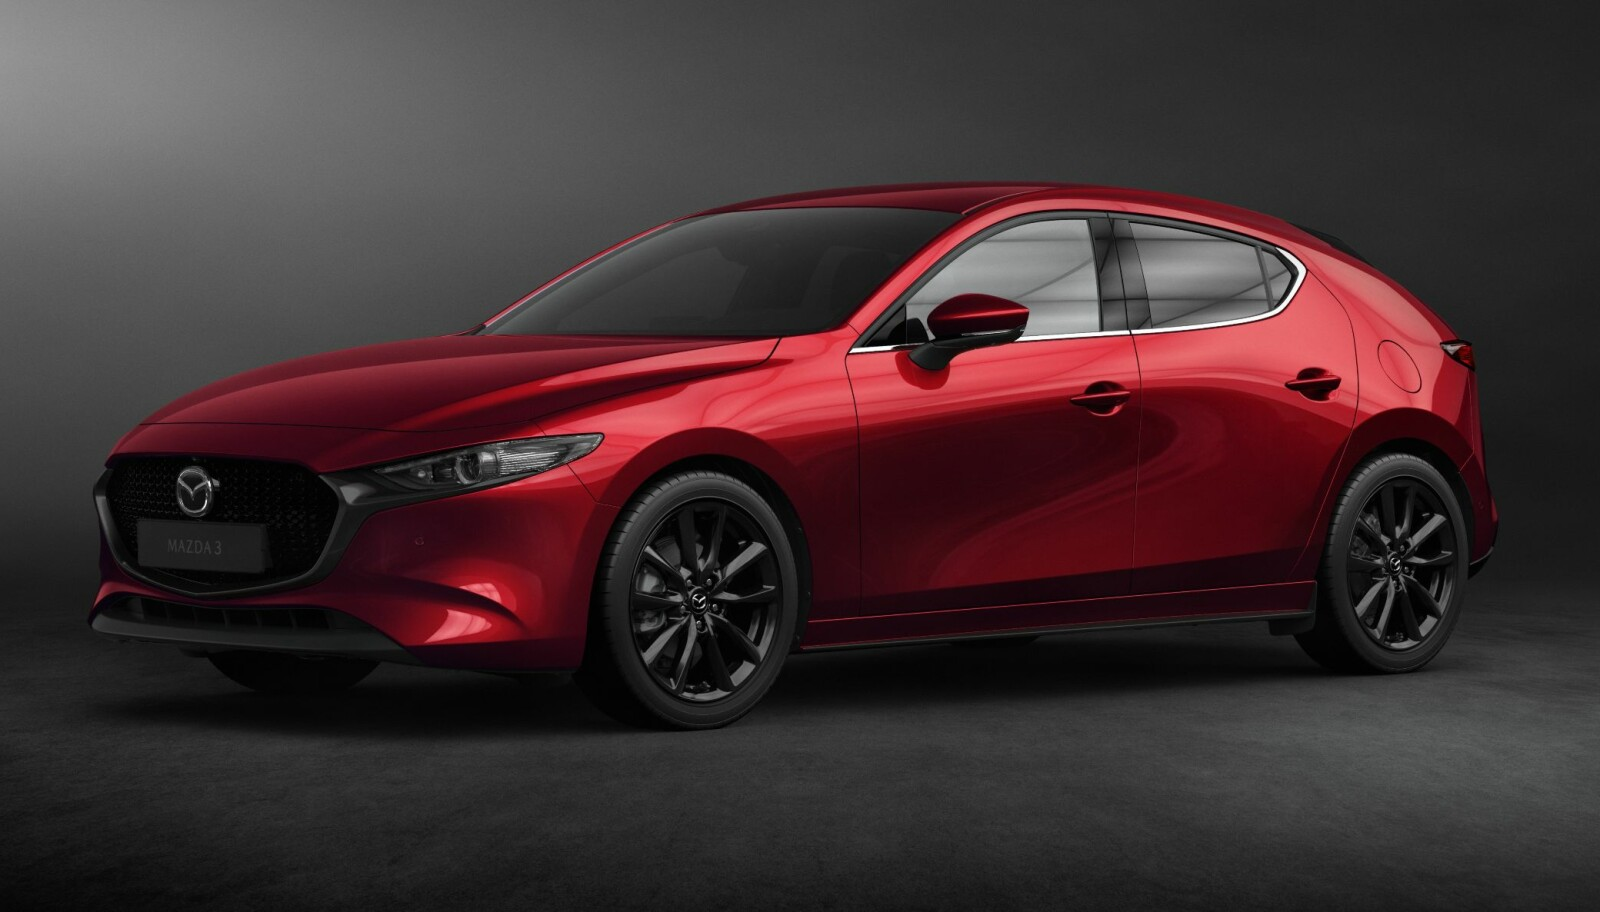 NY: Nye Mazda3 har verdenspremiere i Los Angeles.